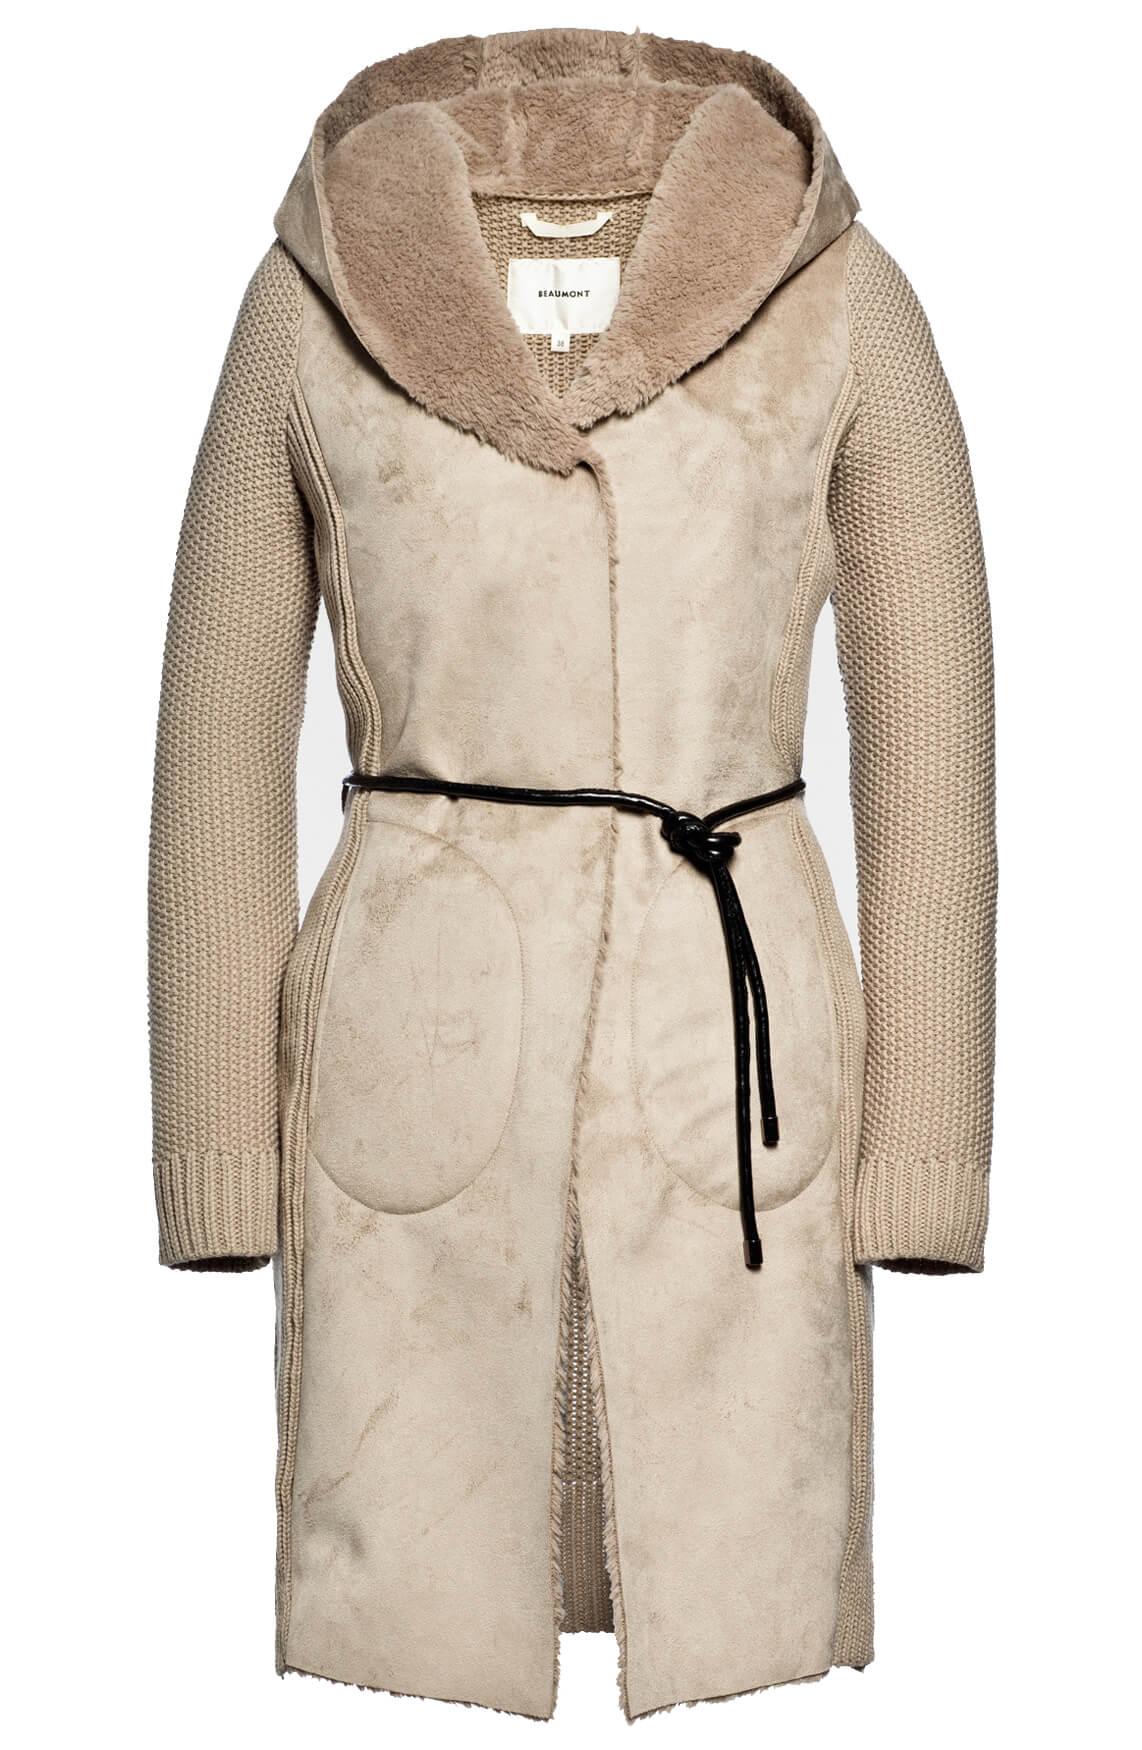 Beaumont Dames Vest met fake fur kraag Ecru